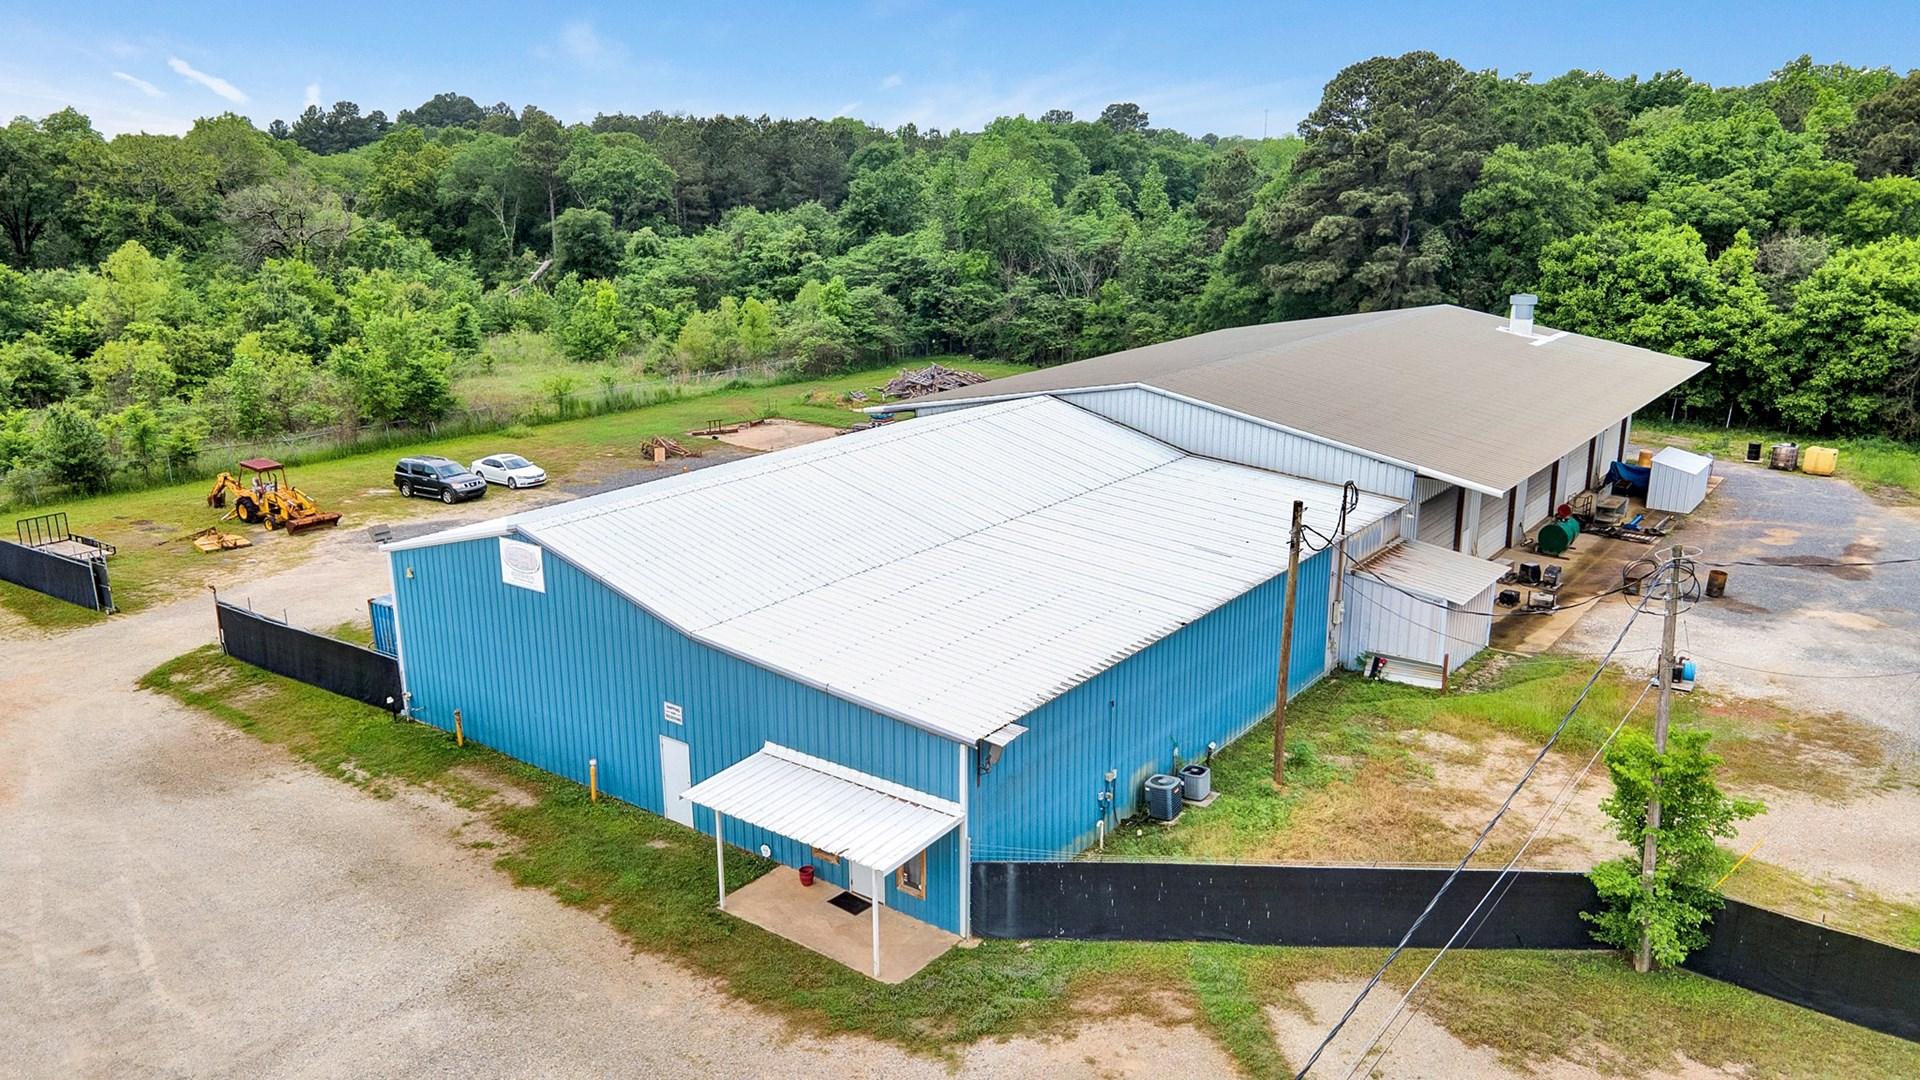 Commercial Property Auction Longview Texas Warehouse